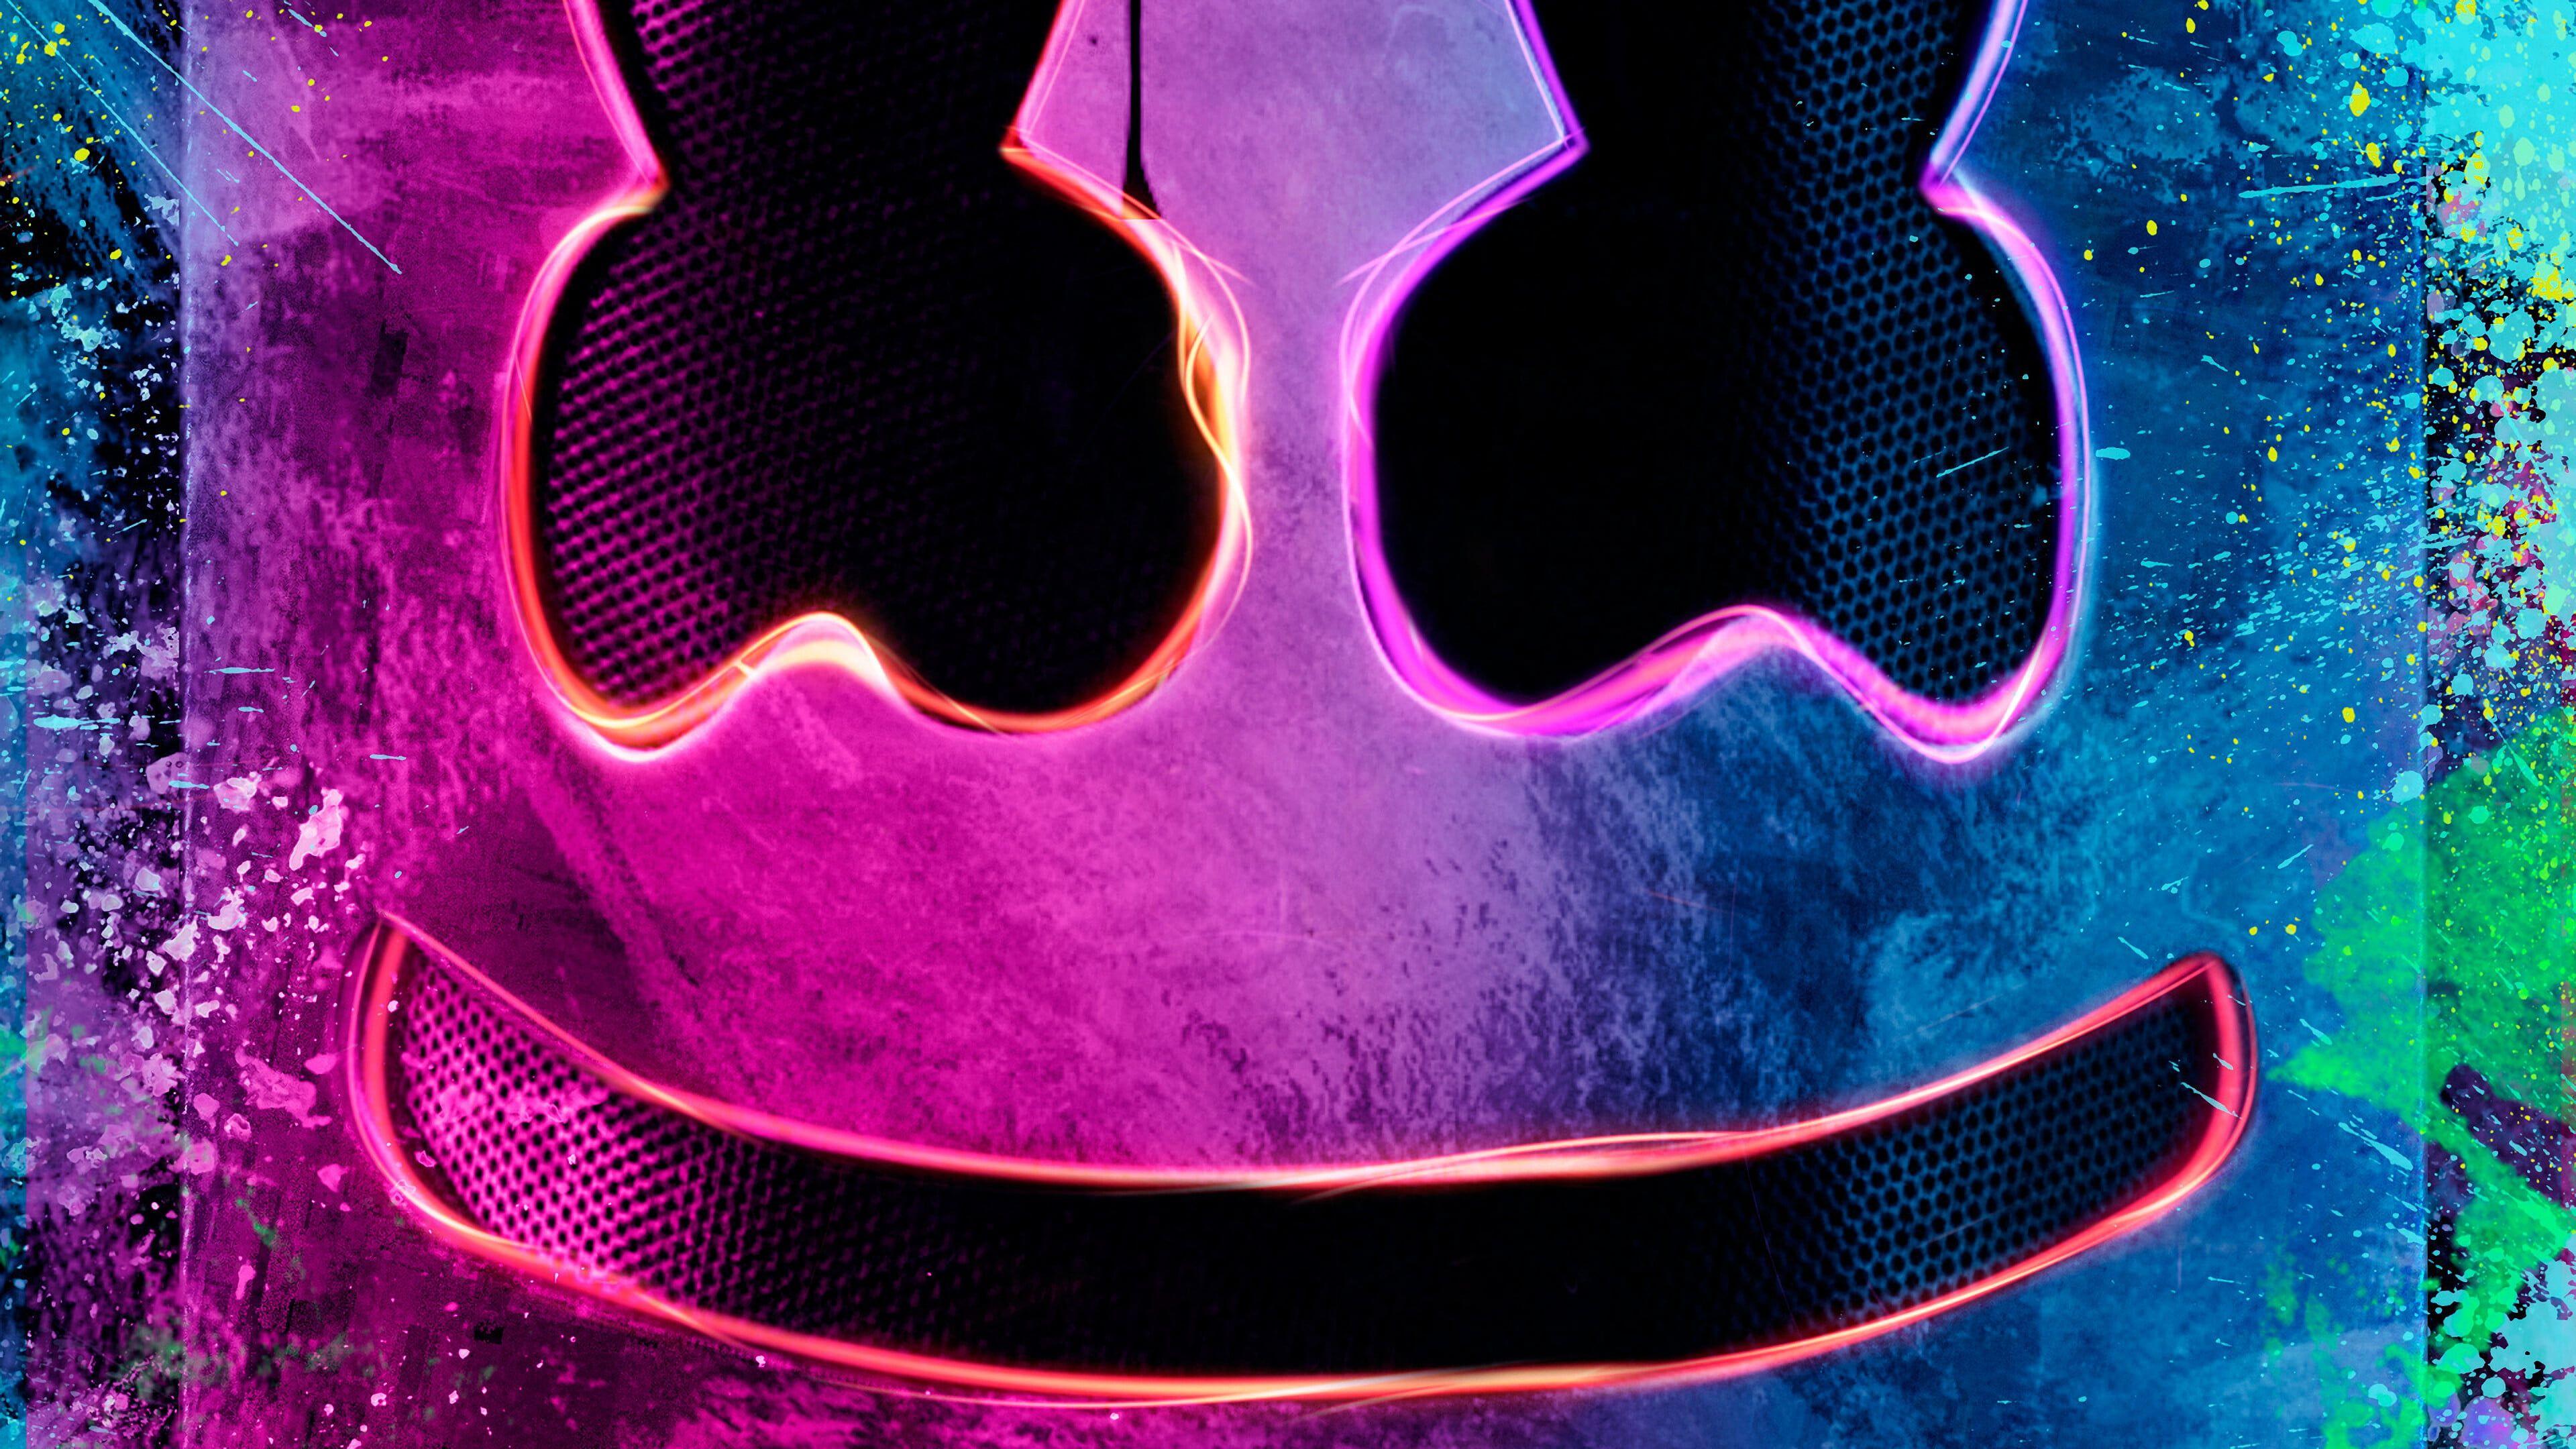 Billie Eilish Alan Walker Alan Walker Logo Marshmello Neon 4k Wallpaper Hdwallpaper Desktop Alan Walker Hd Wallpaper Marshmallow Pictures